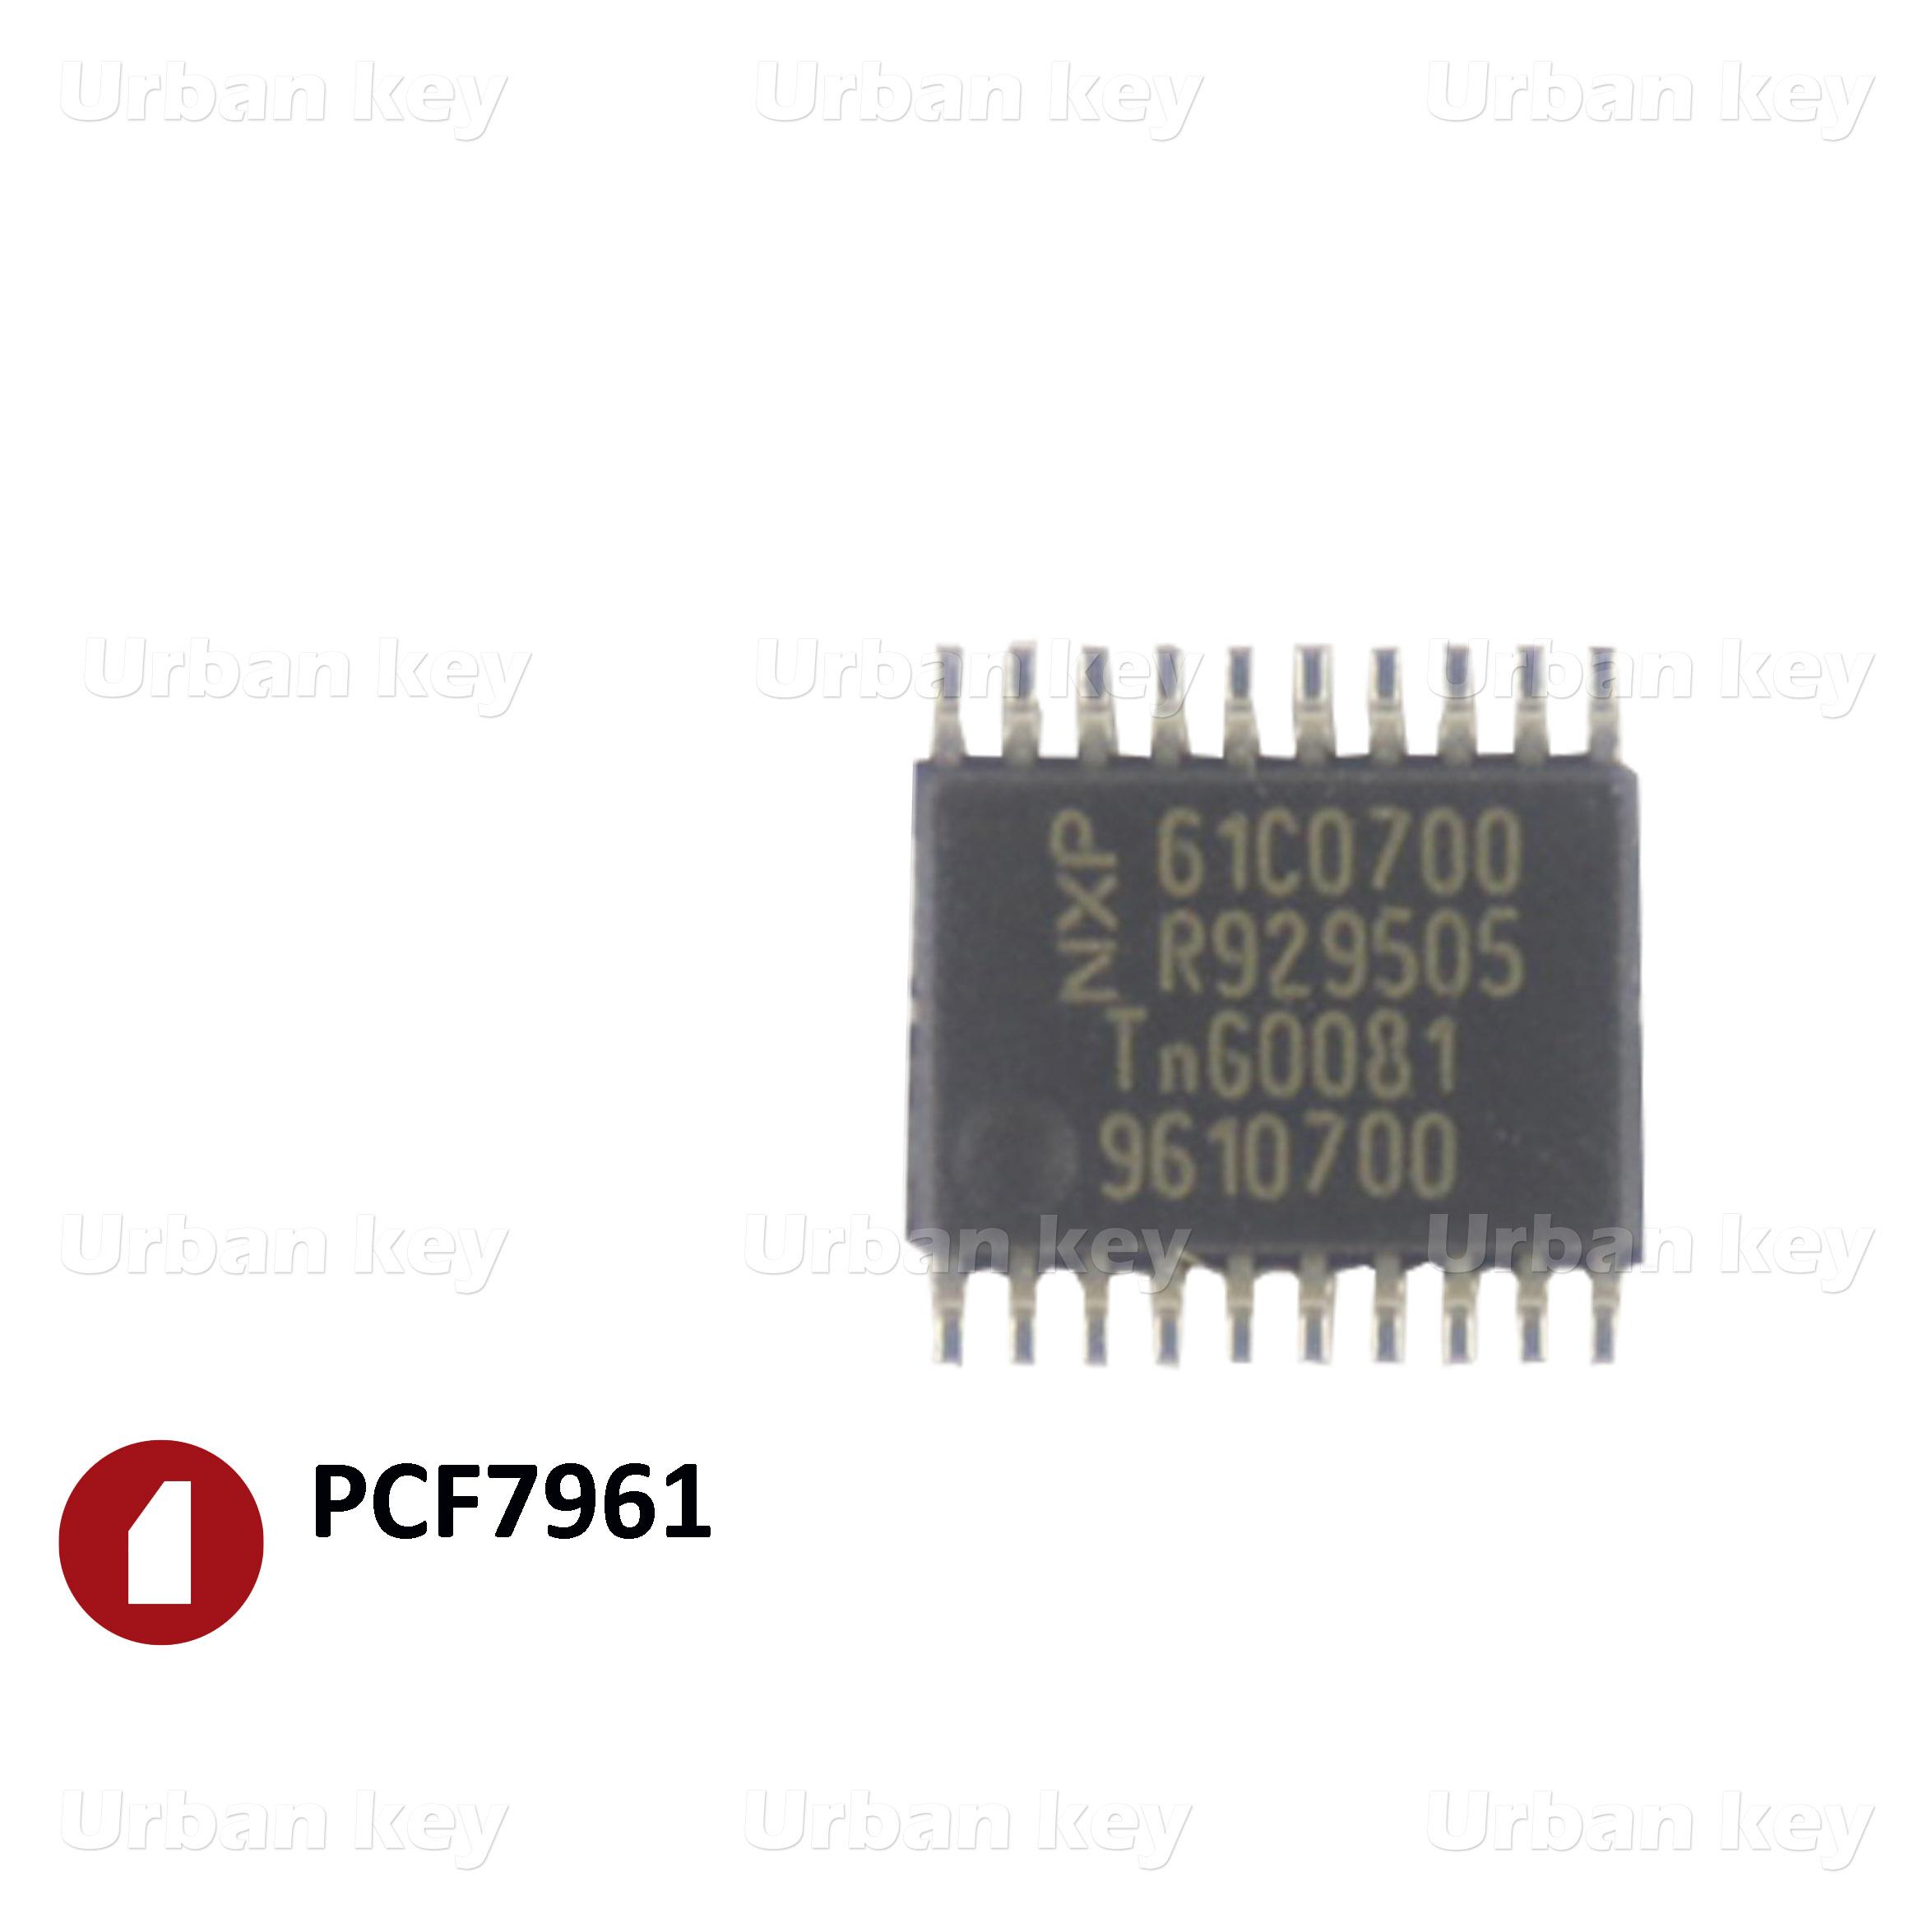 TRANSPONDER PCF 7961